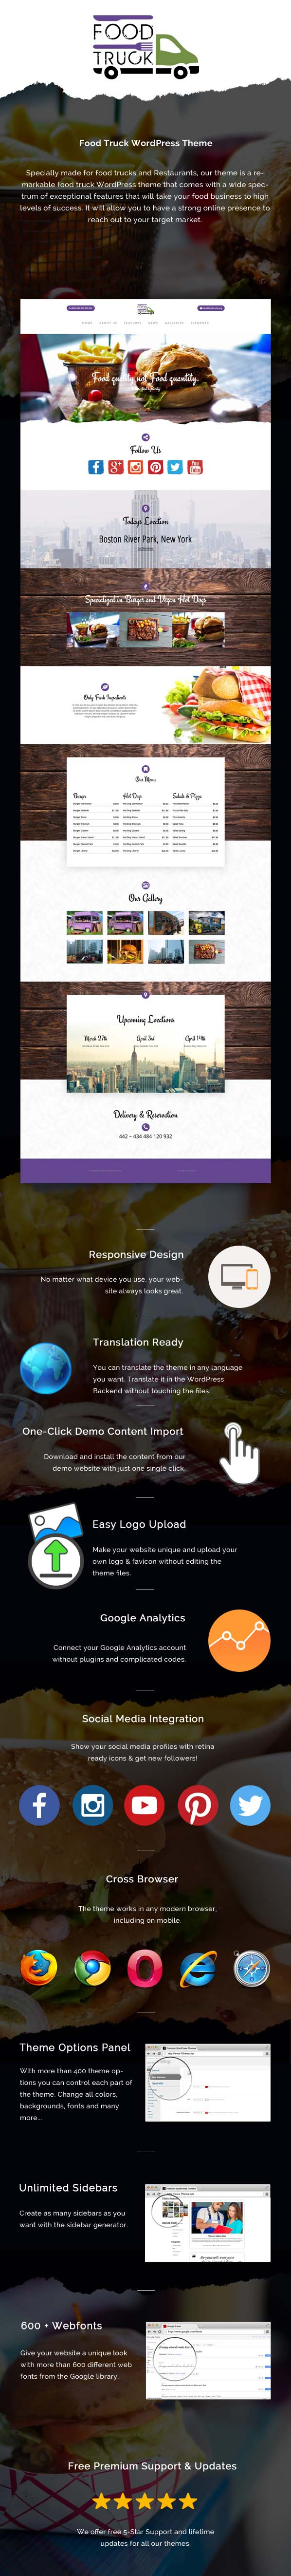 mojo-grafic-foodtruck-CxUPx.jpg